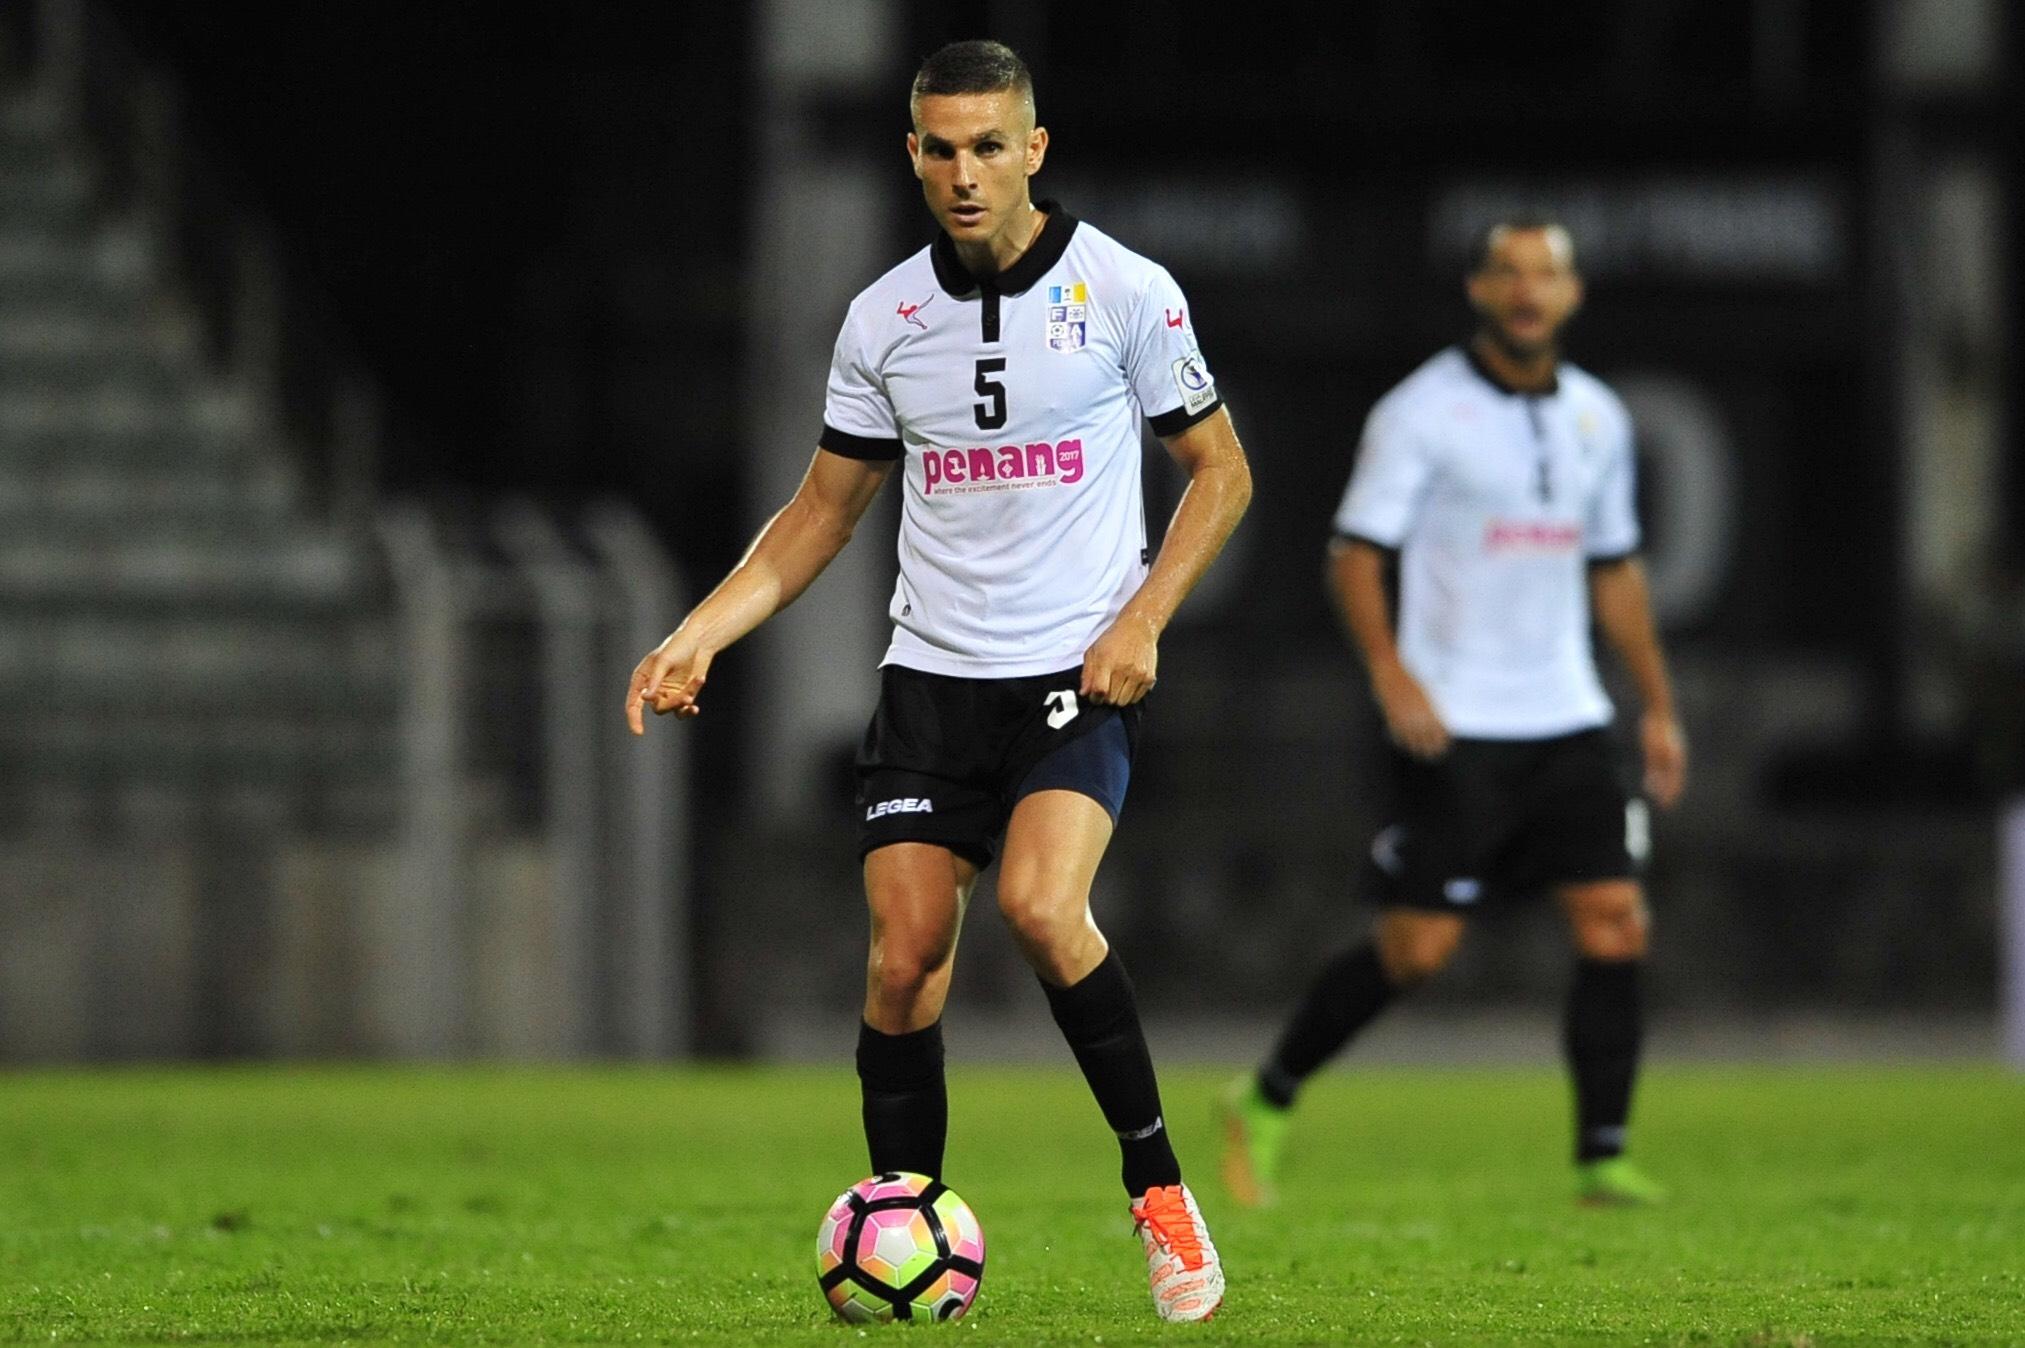 Pulau Pinang's Diogo Ferreira playing against Selangor 21/1/2017